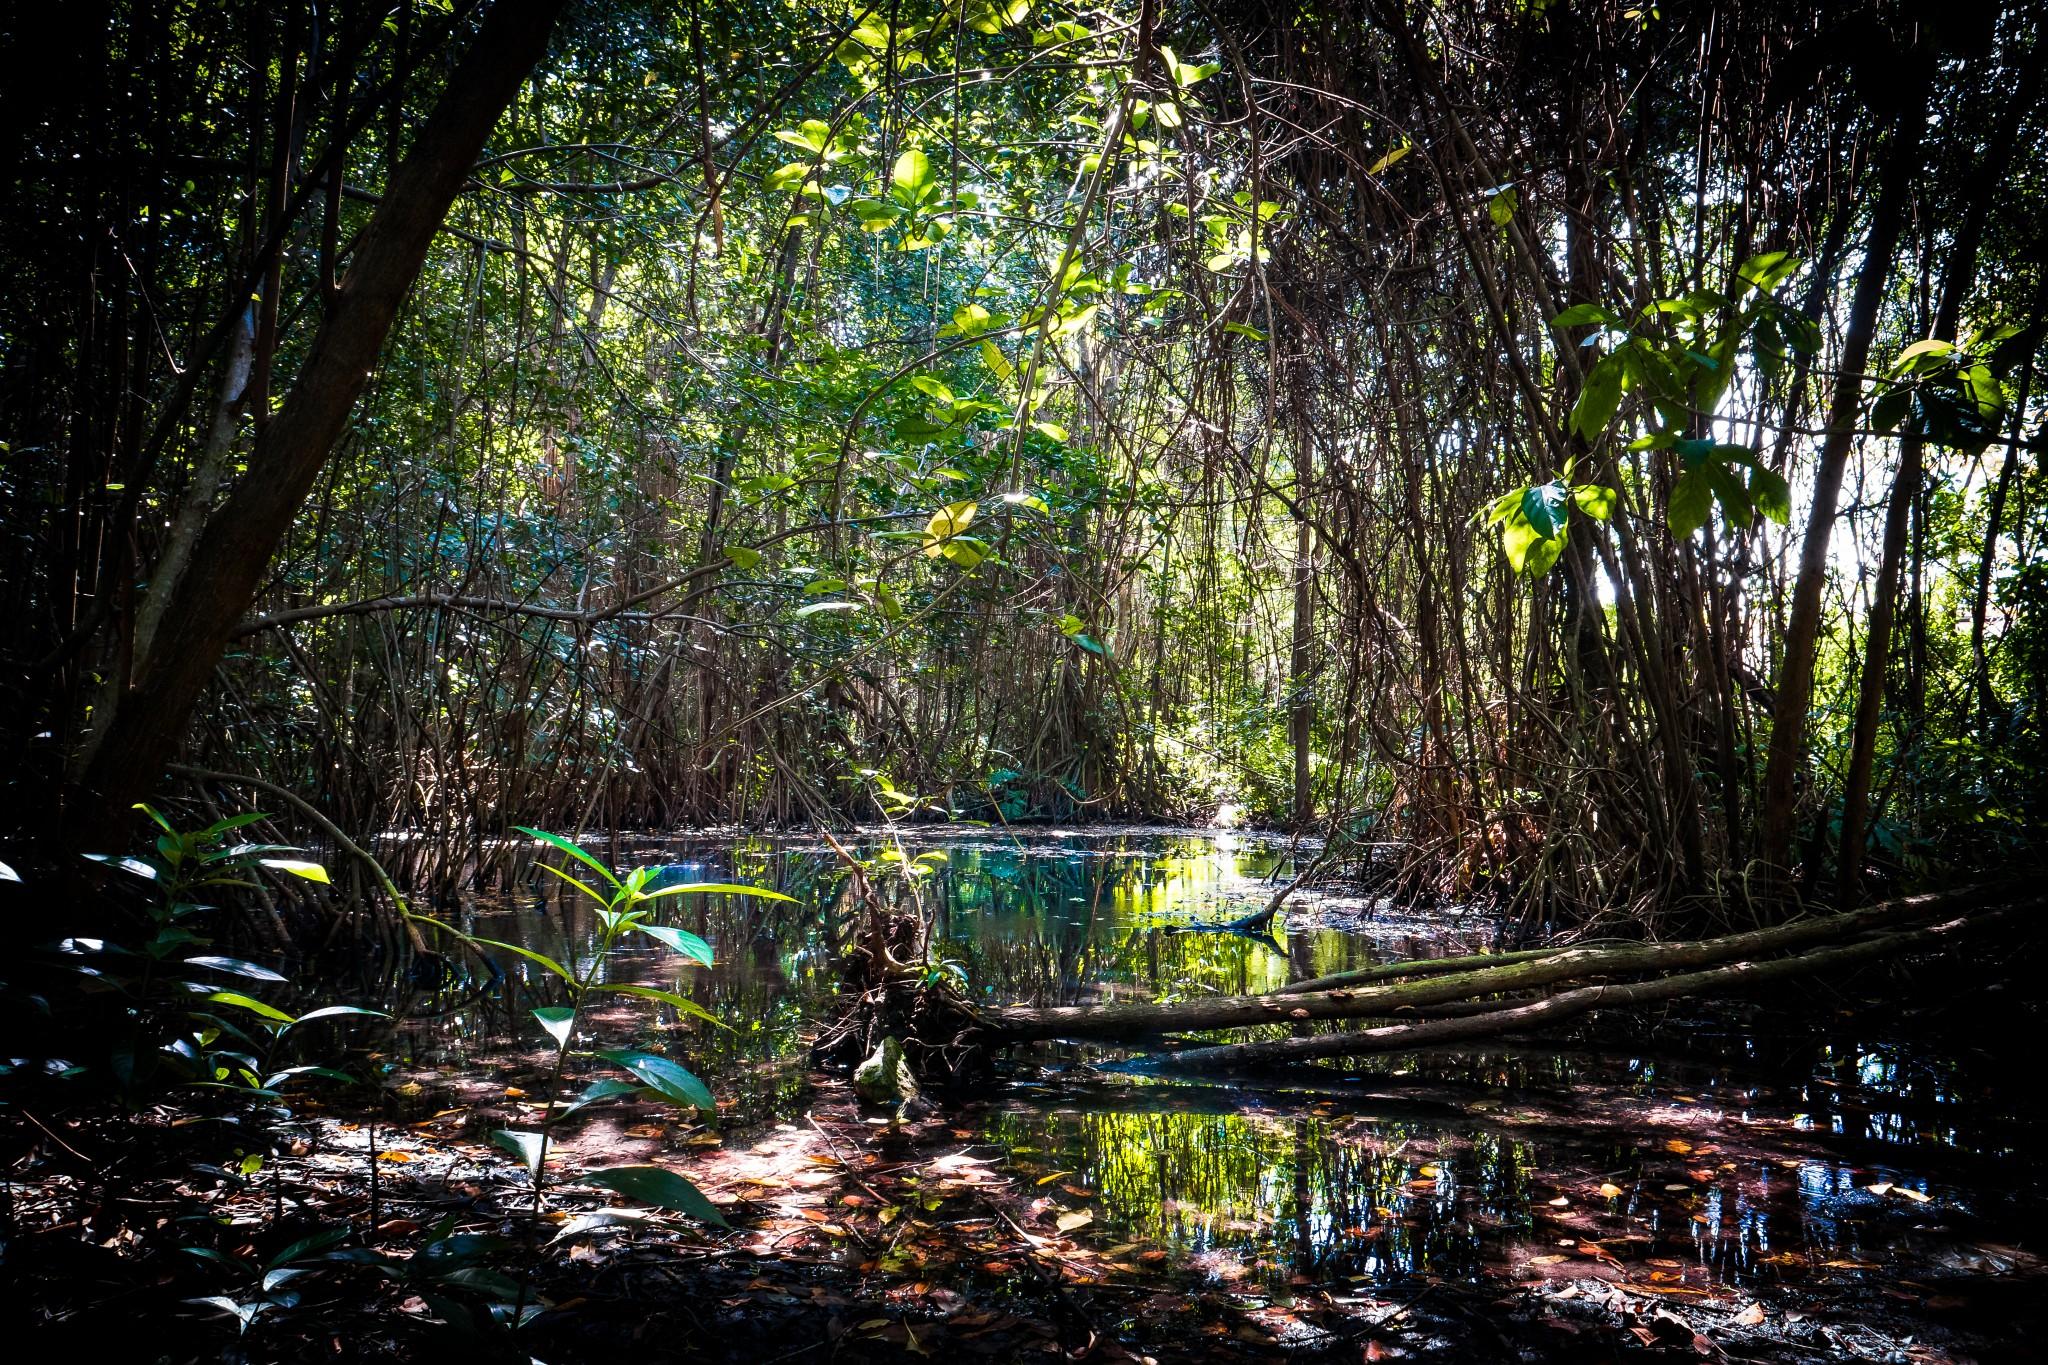 Photography Meets Adventure With New Grand Velas Riviera Maya